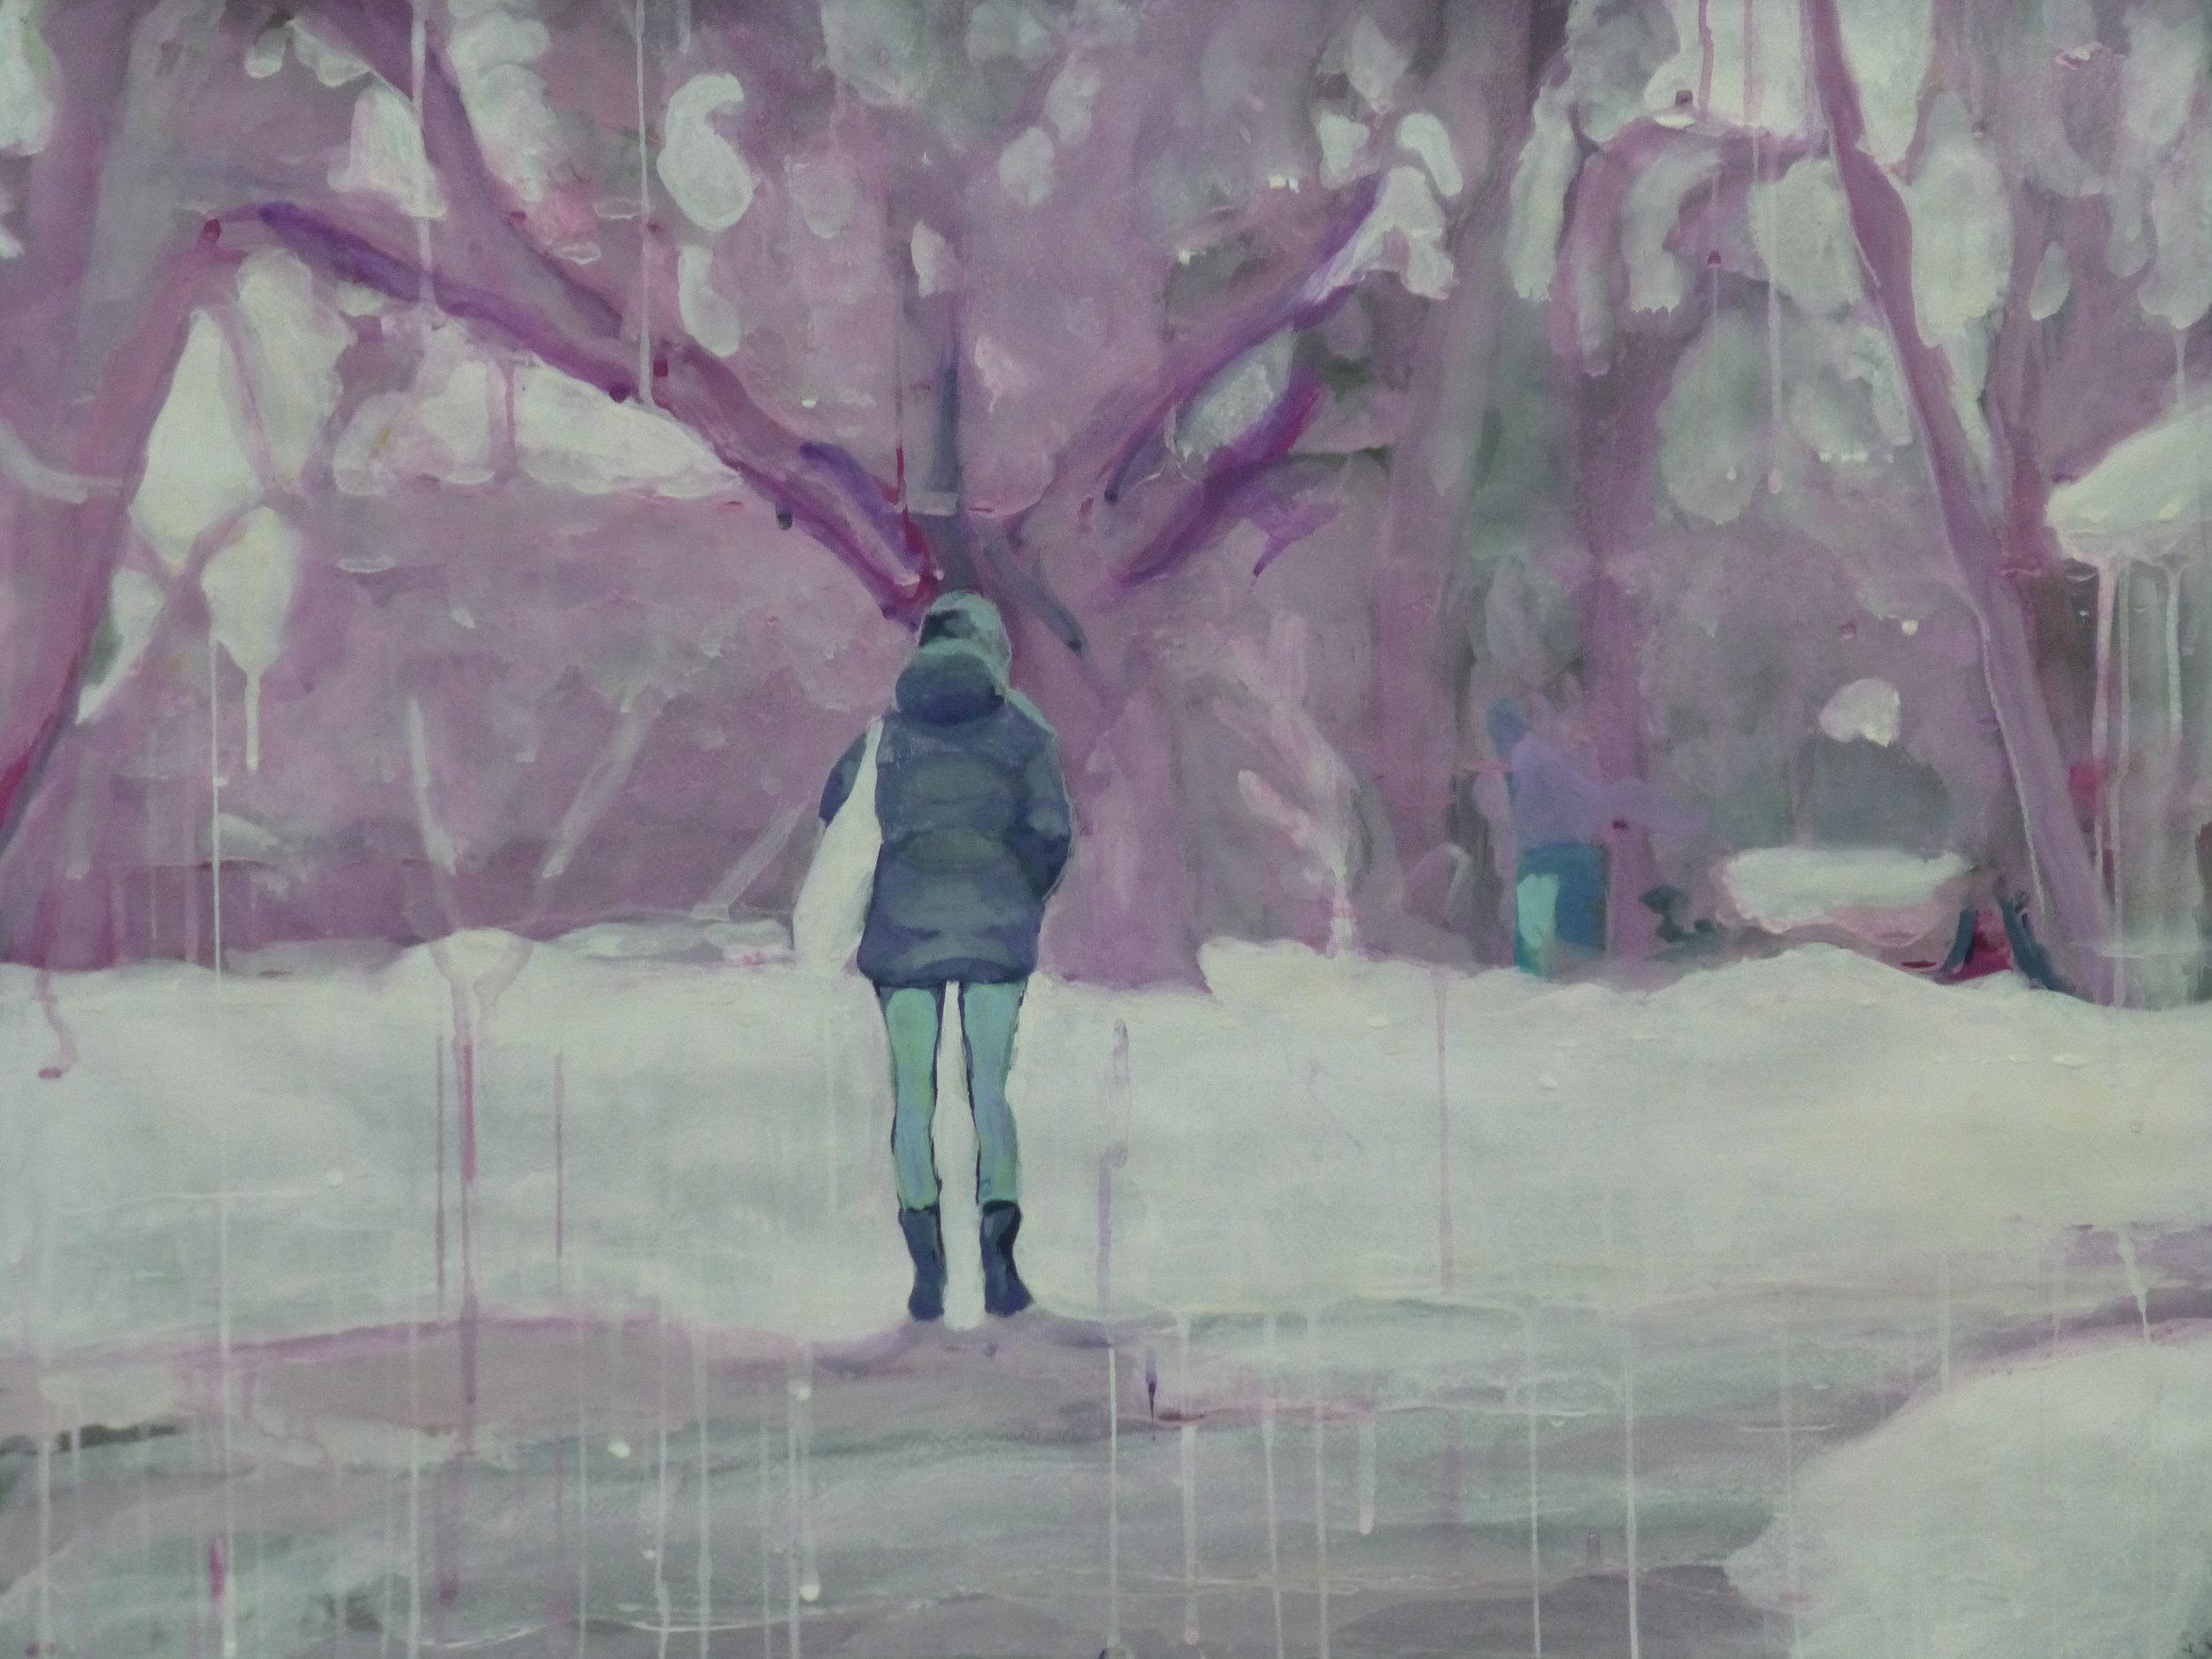 "On My Way 25.5"" x 19.5"" Gouache on paper 2014"